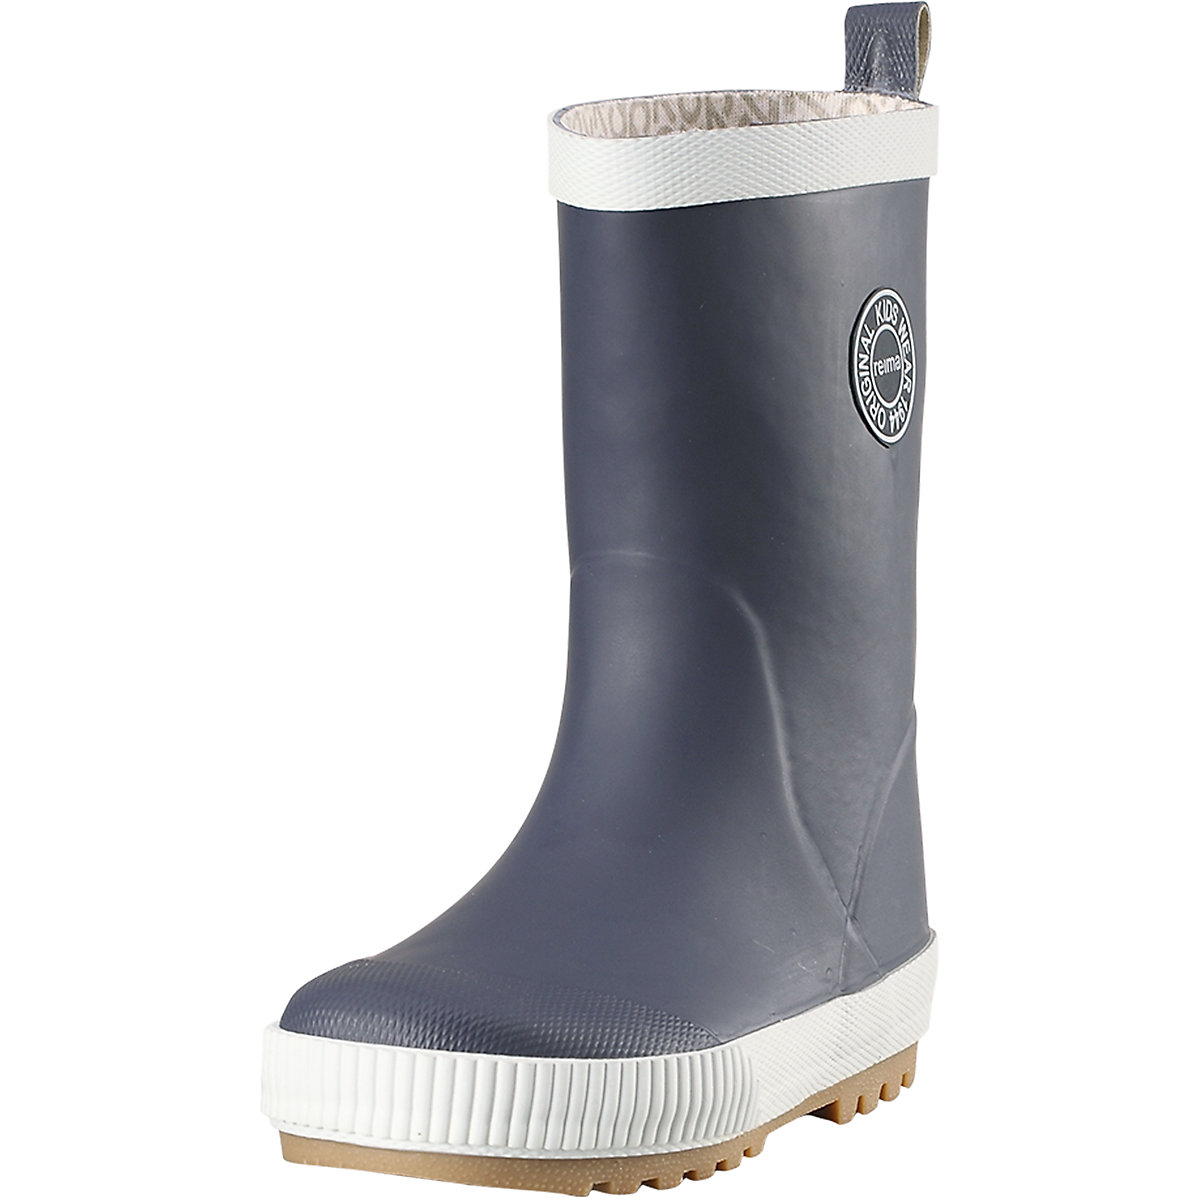 REIMA Boots 8739545 for boys spring autumn boy  children shoes